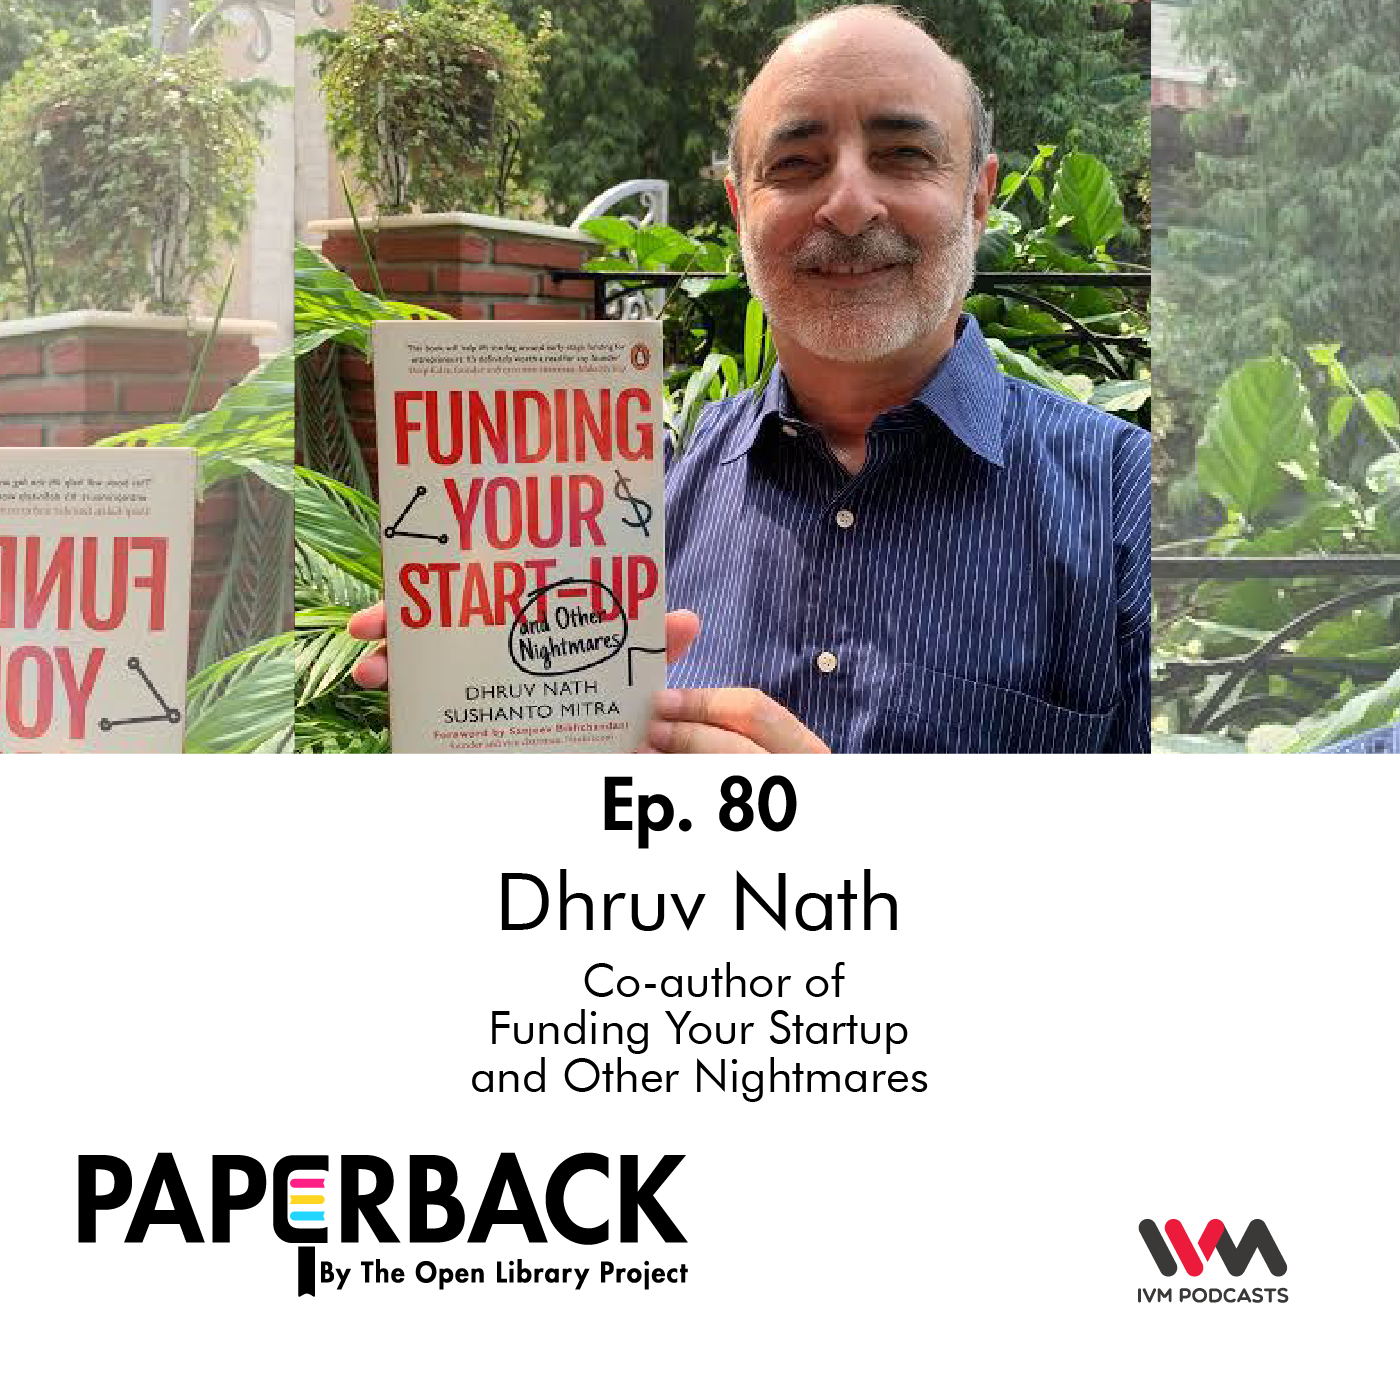 Ep. 80: Dhruv Nath